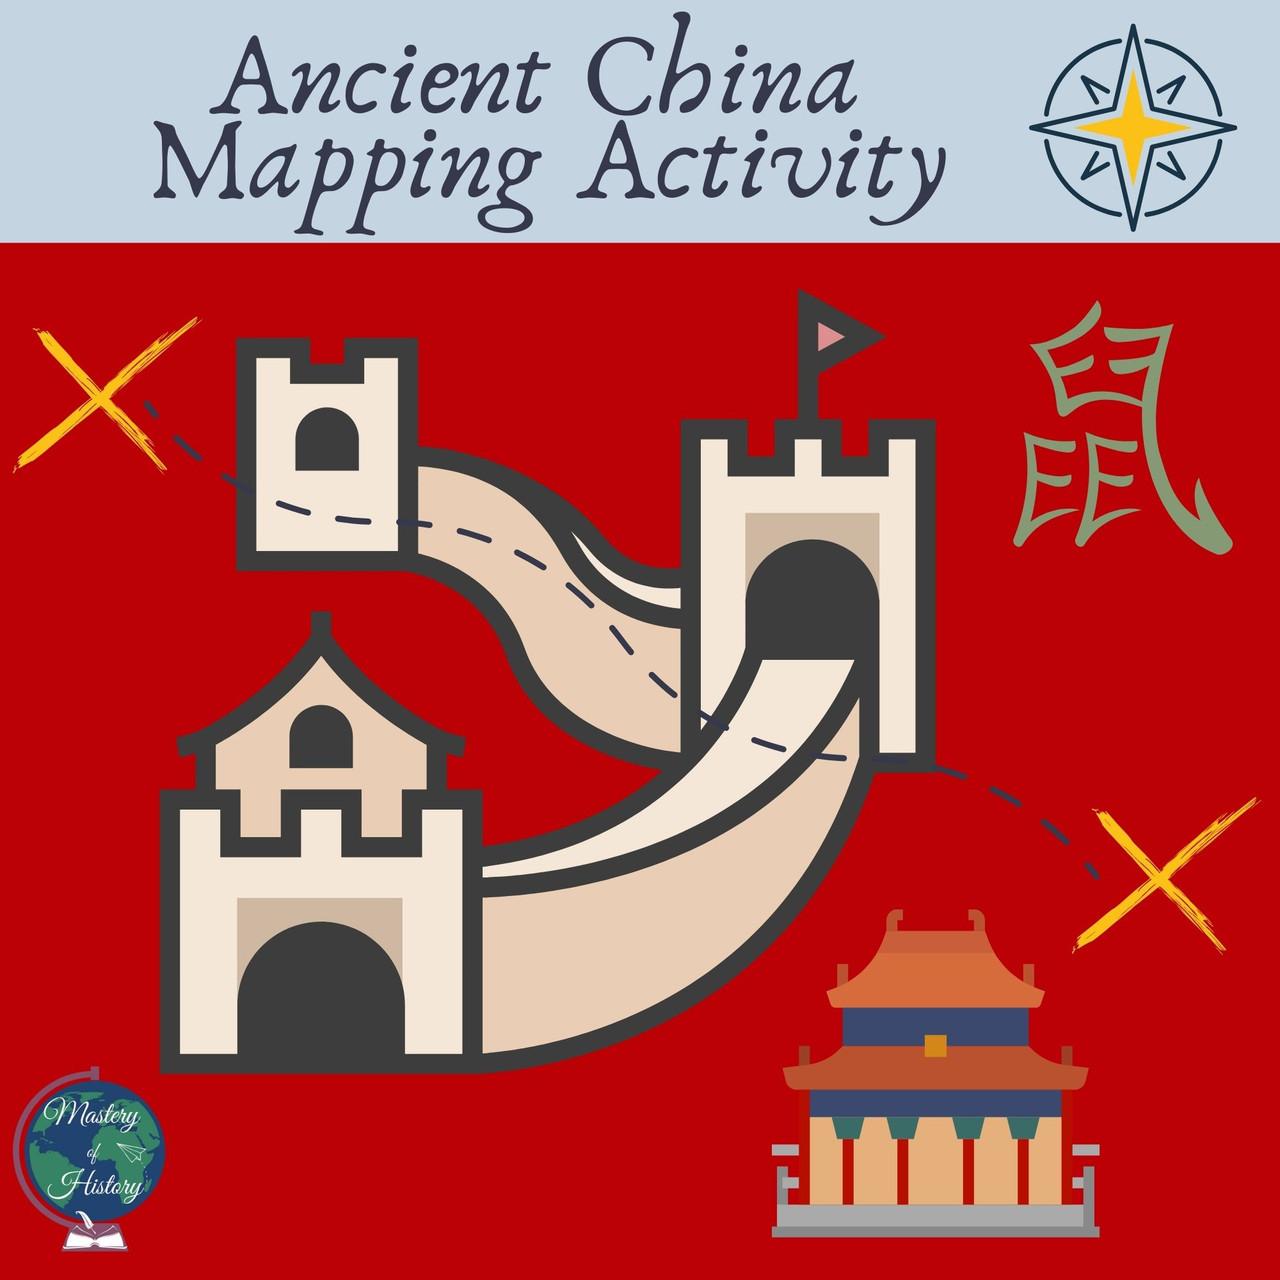 Ancient China Mapping Activity